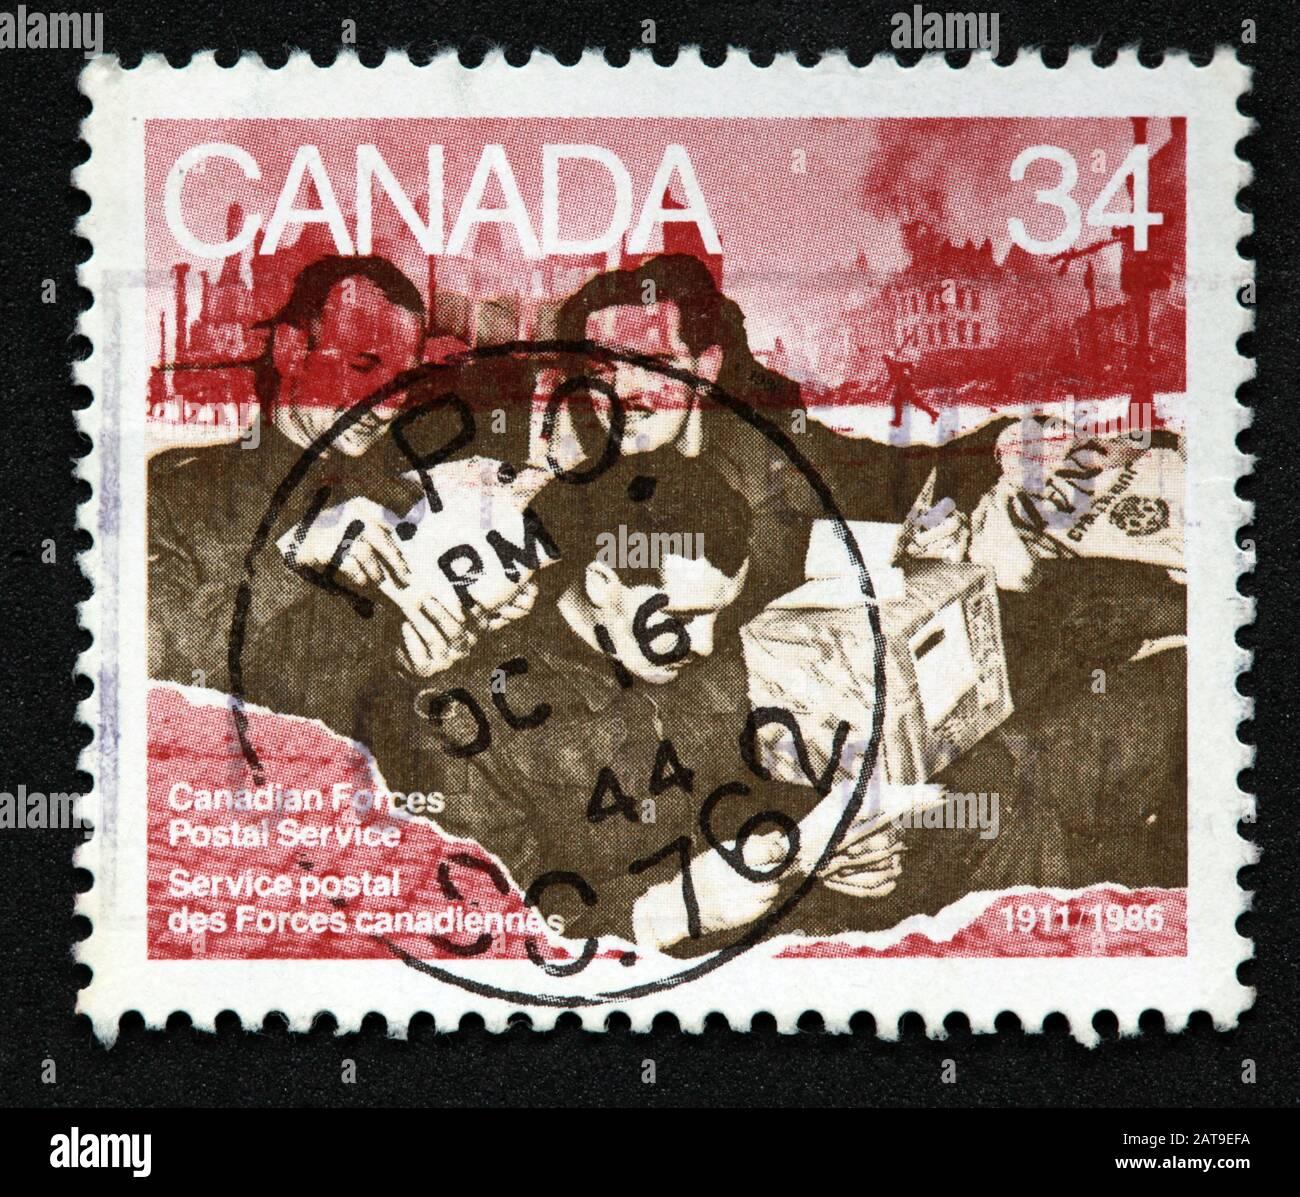 Hotpixuk,@Hotpixuk,GoTonySmith,stamp,postal,franked,frank,used stamps,used franked,used,franked stamp,from envelope,history,historic,old,poste,post office,communications,postage,sending letters,sending,parcels,34c,Service Postal des forces canadiennas,34c stamp,Canadian Forces,Postal service,Service Postal,des,forces canadiennas,army,navy,fighting,forces,airforce,air force,Canadian